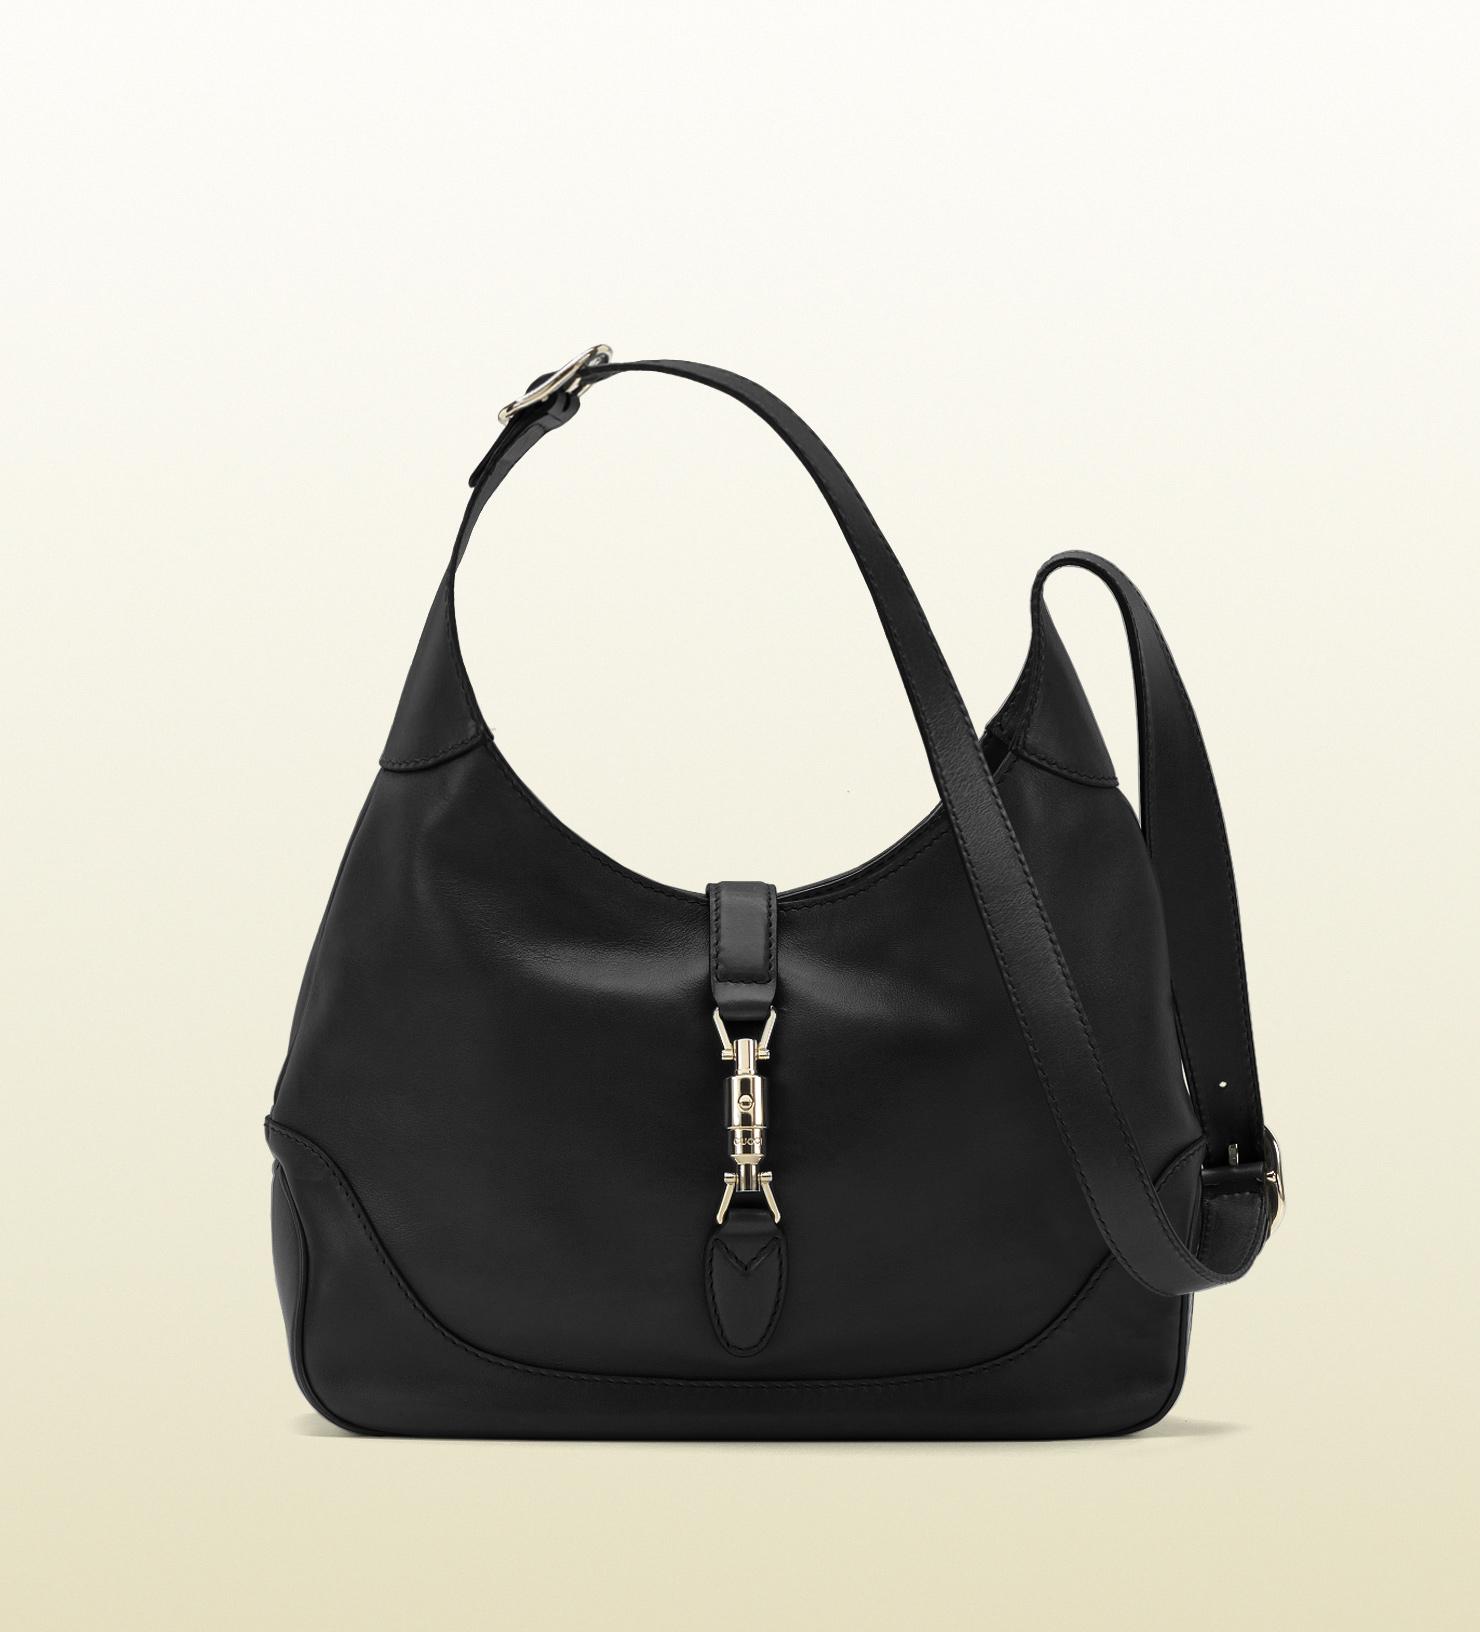 1df8e5c53ce Lyst - Gucci Jackie Leather Shoulder Bag in Black